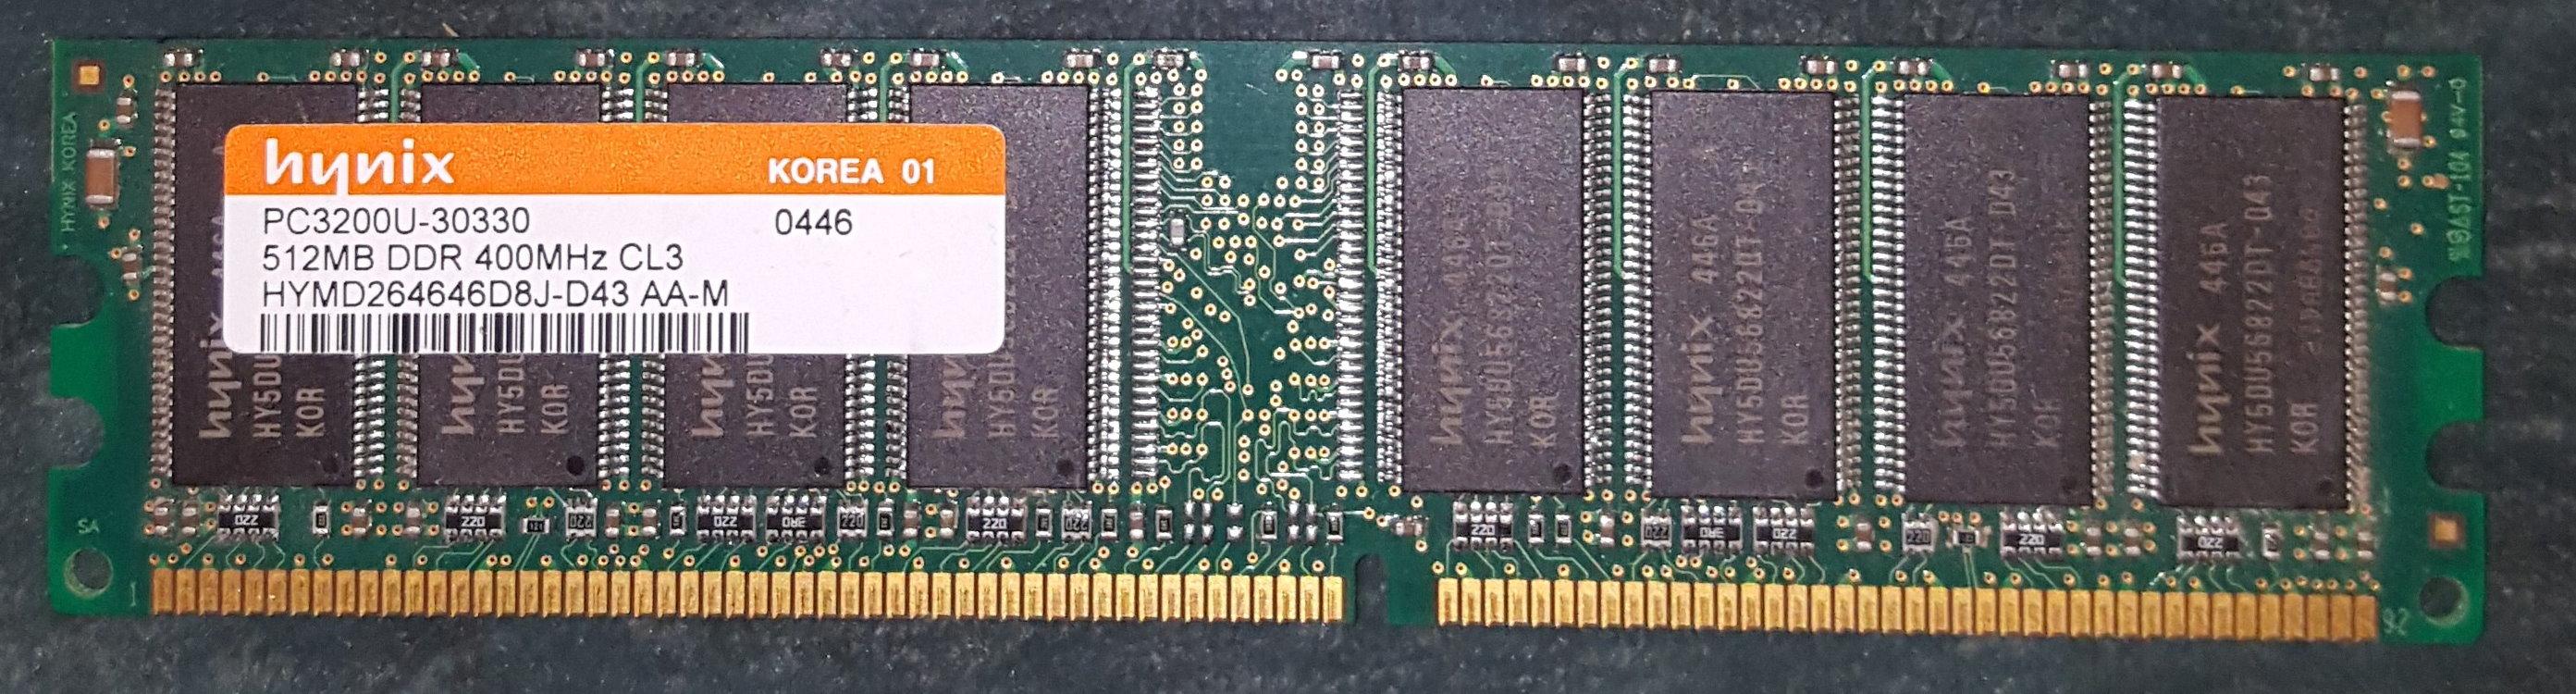 Hynix 512 Mb DDR 400 Mhz PC3200U-30330 CL3 HYMD264646D8J-D43 AA-M – Occasion